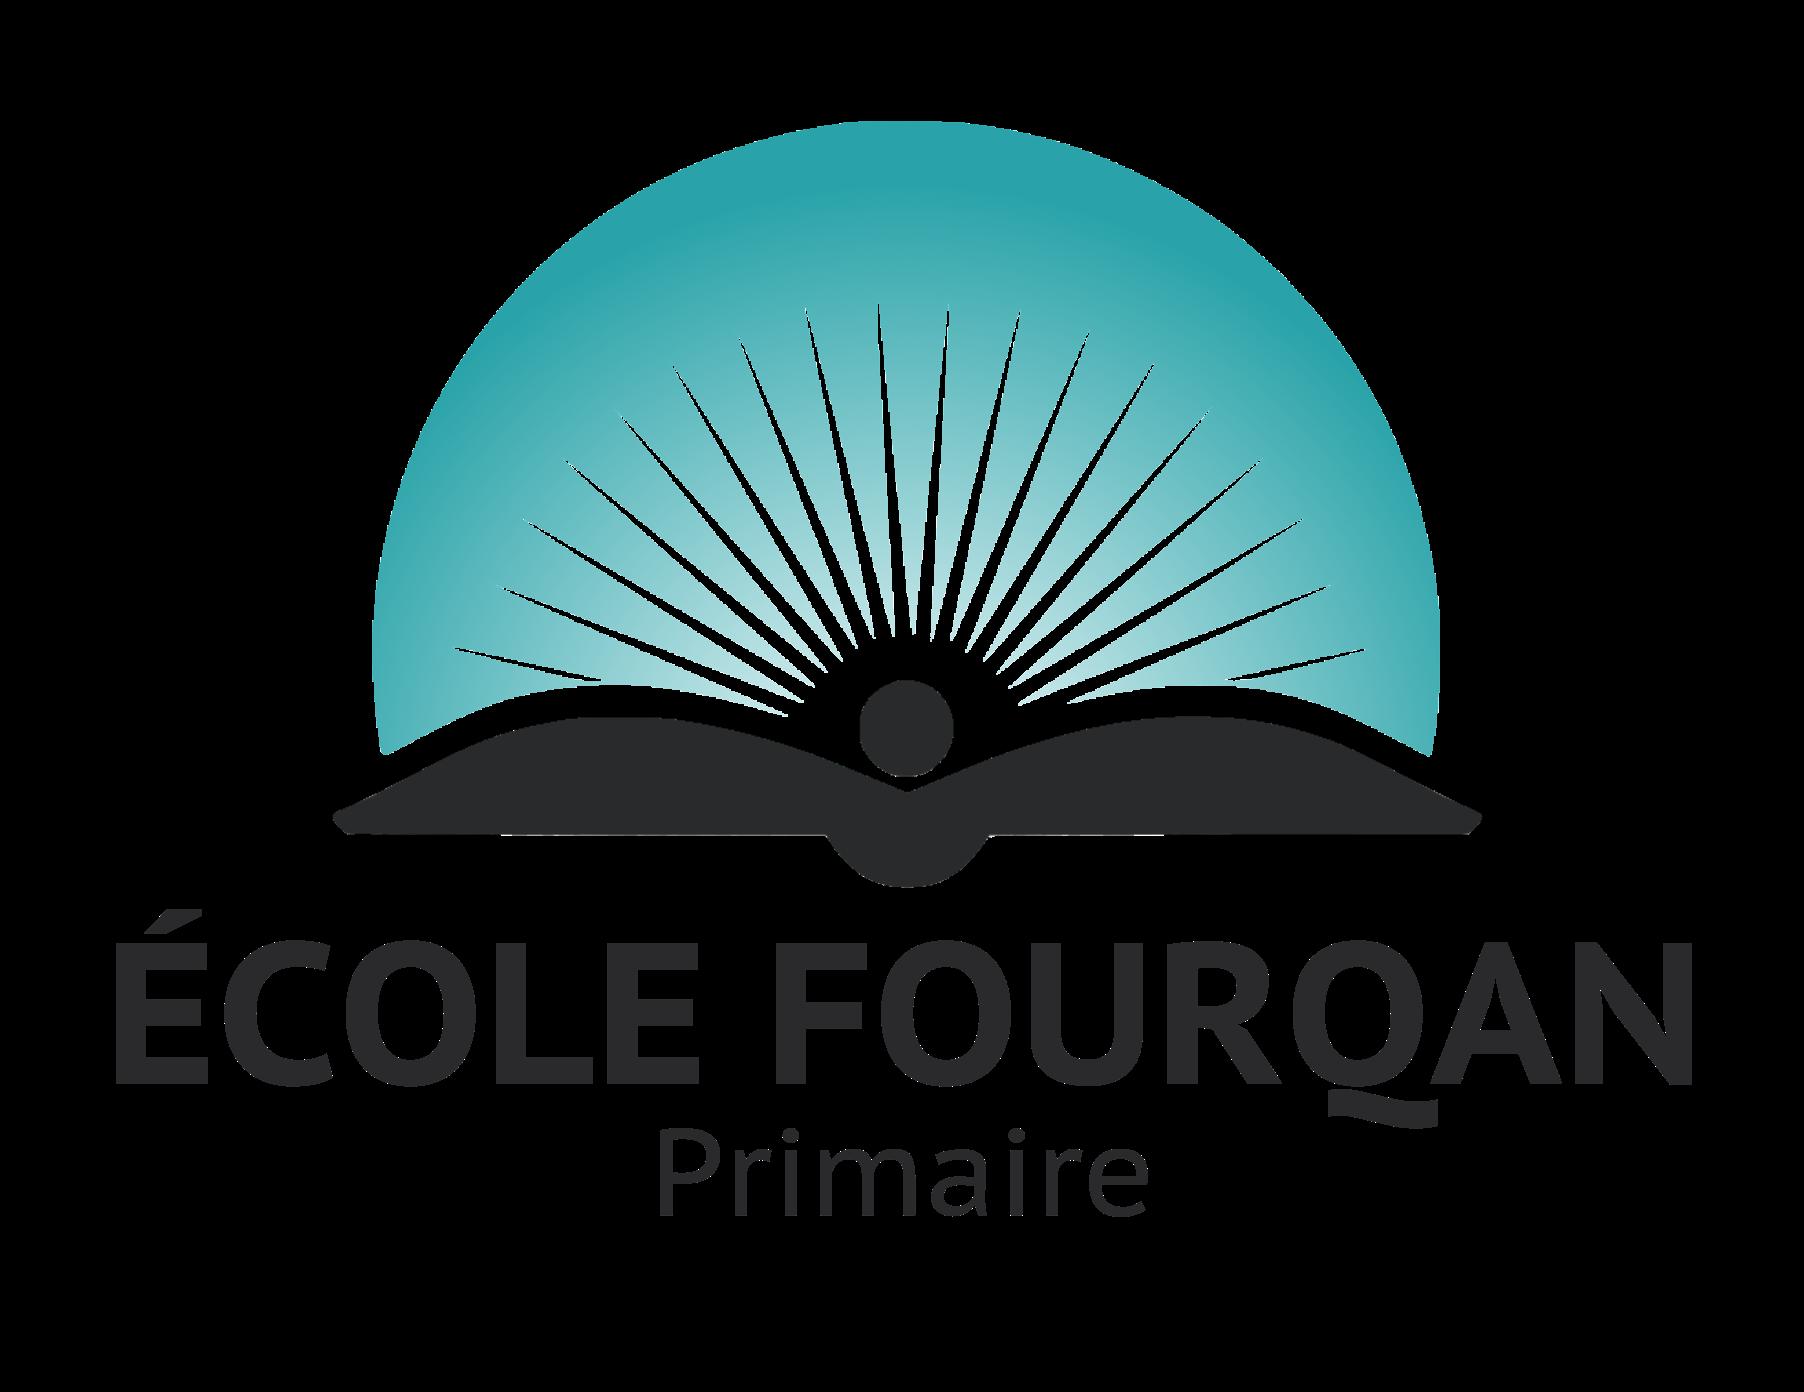 Ecole Fourqan